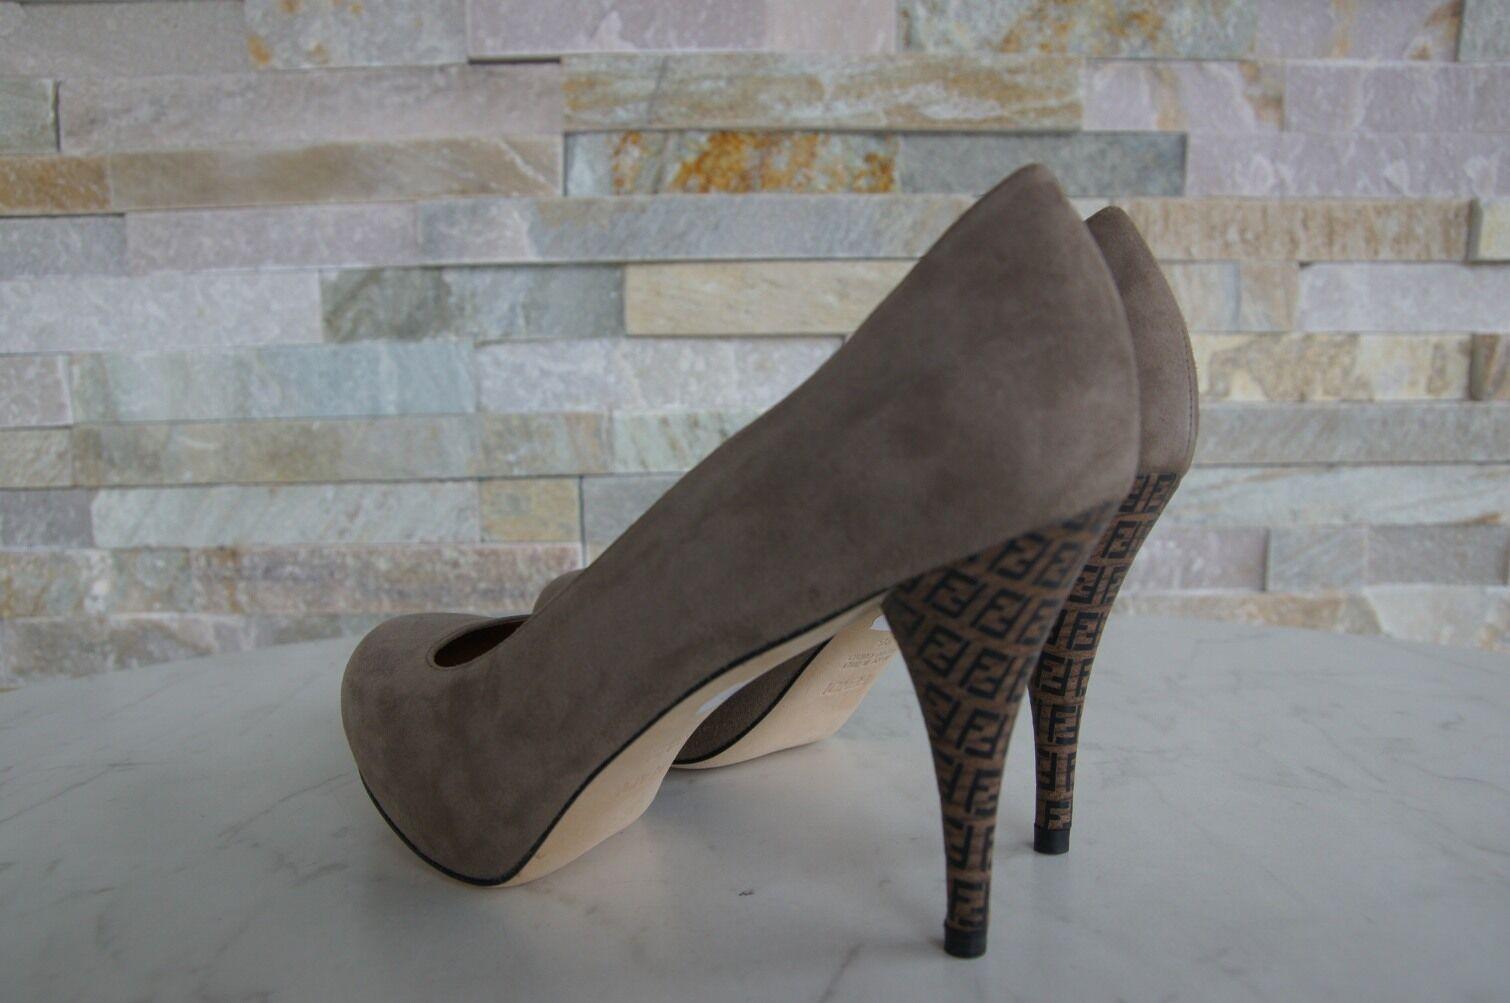 Luxus FENDI Gr Decollete 36 Plateau Pumps Schuhe 8I3697 Decollete Gr schlamm NEU 5a10f6